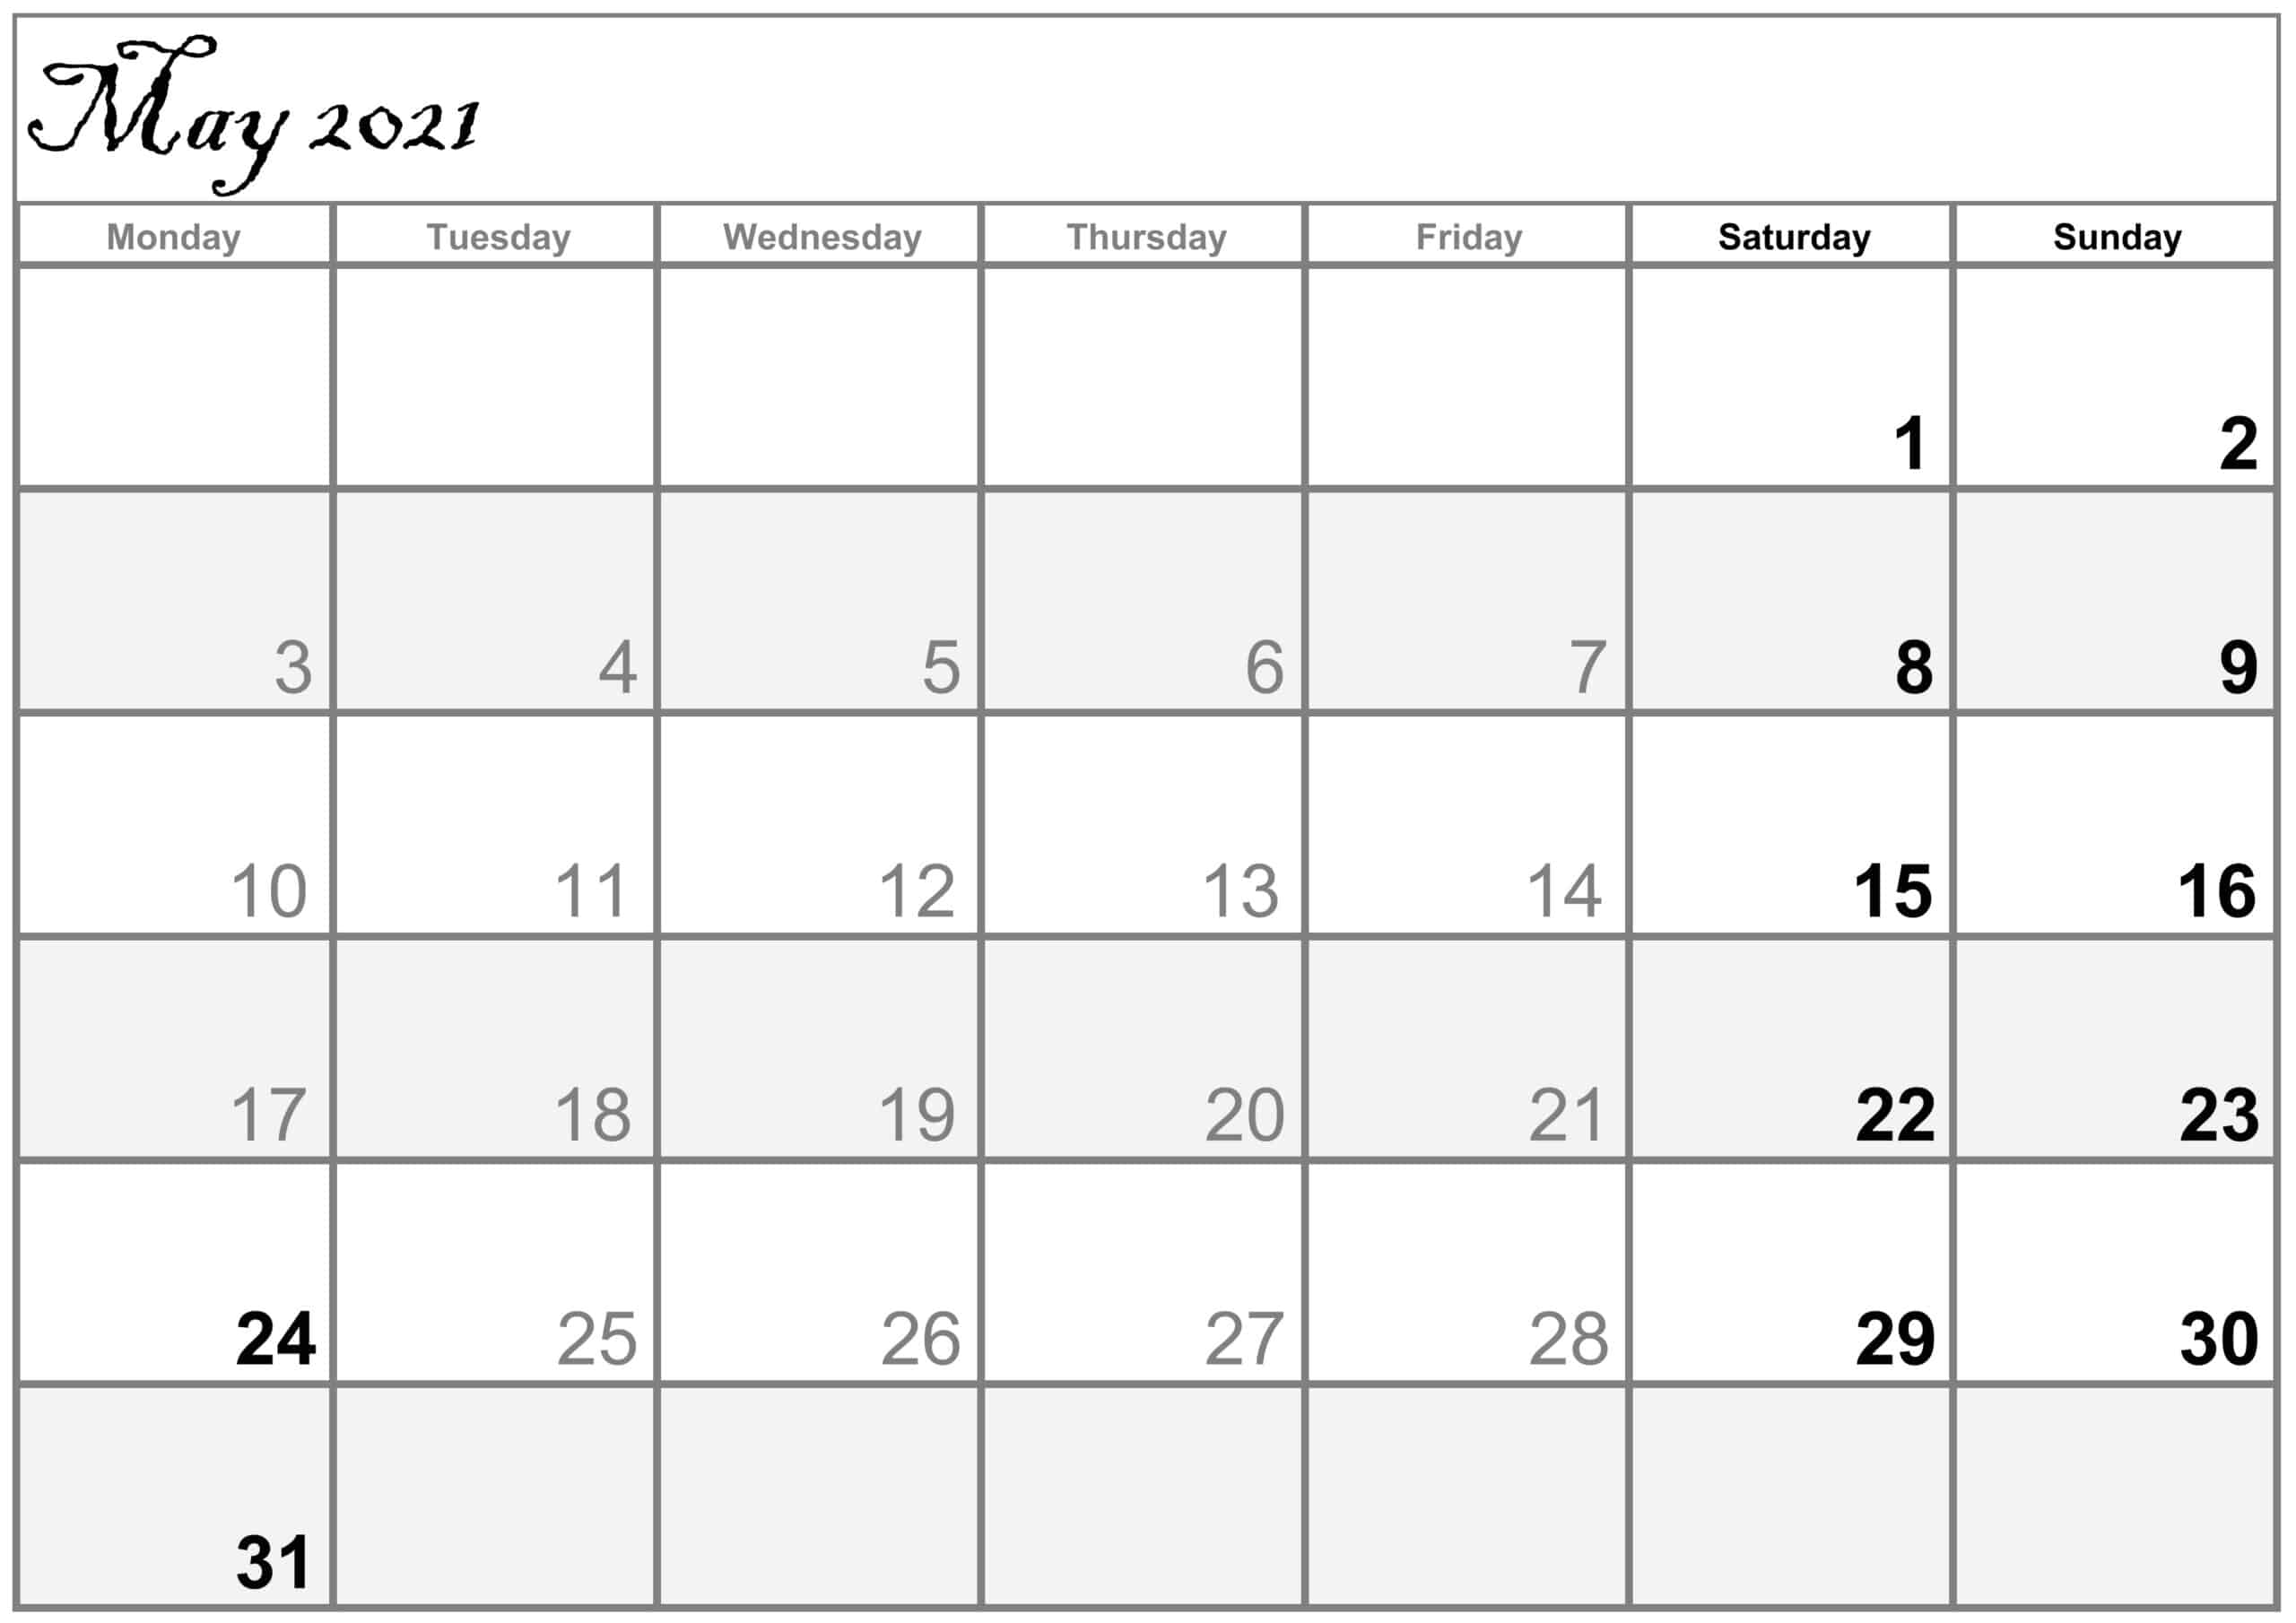 Excel May 2021 Calendar free